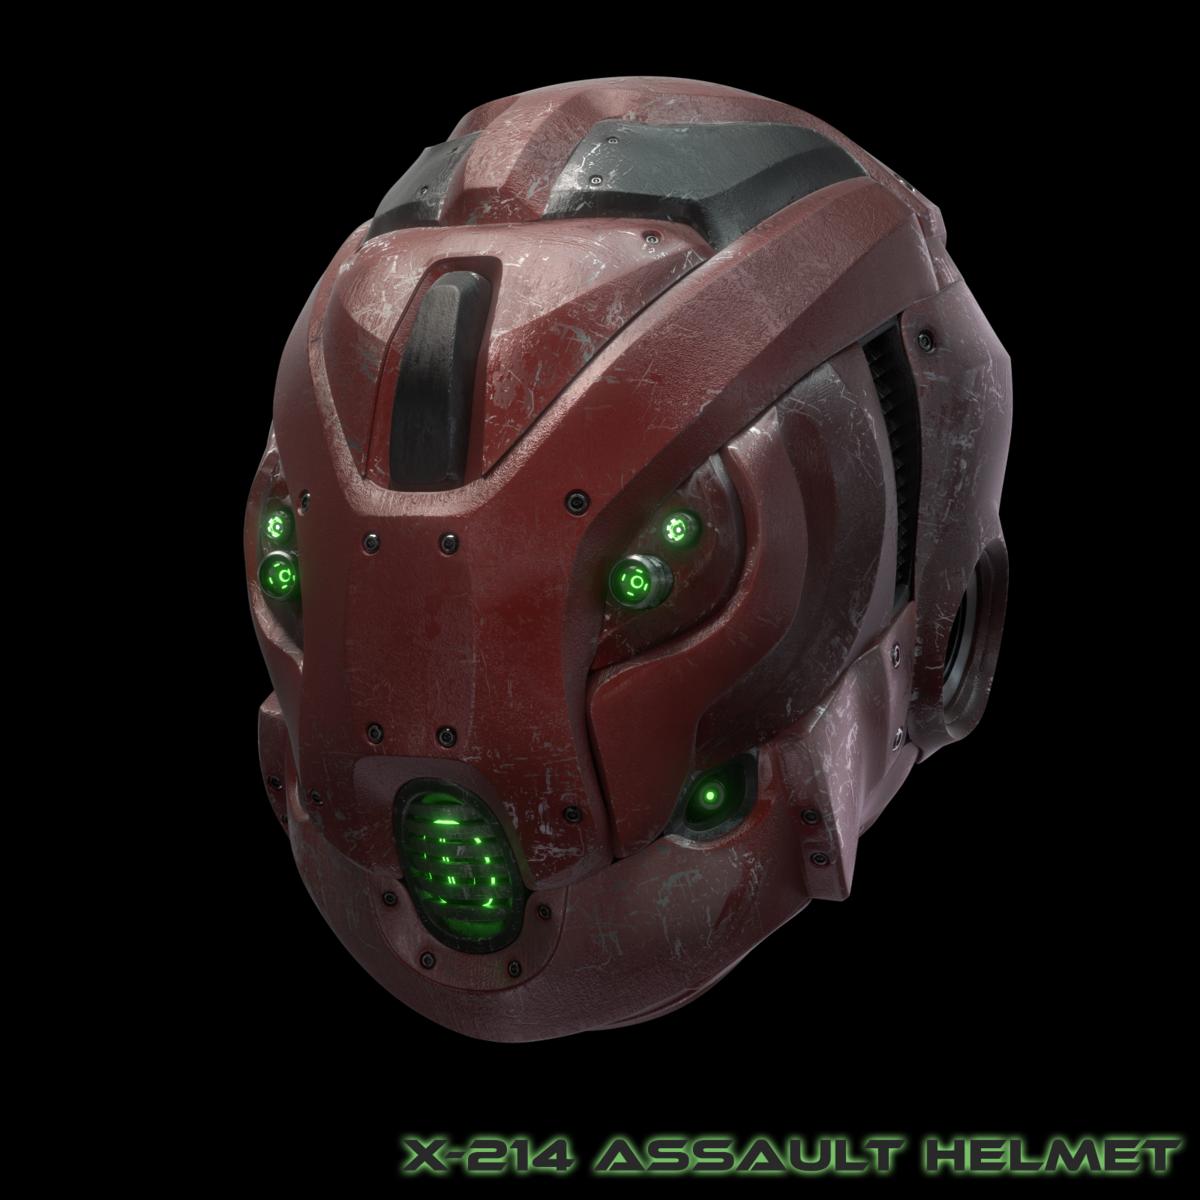 X-214 Assault Helmet